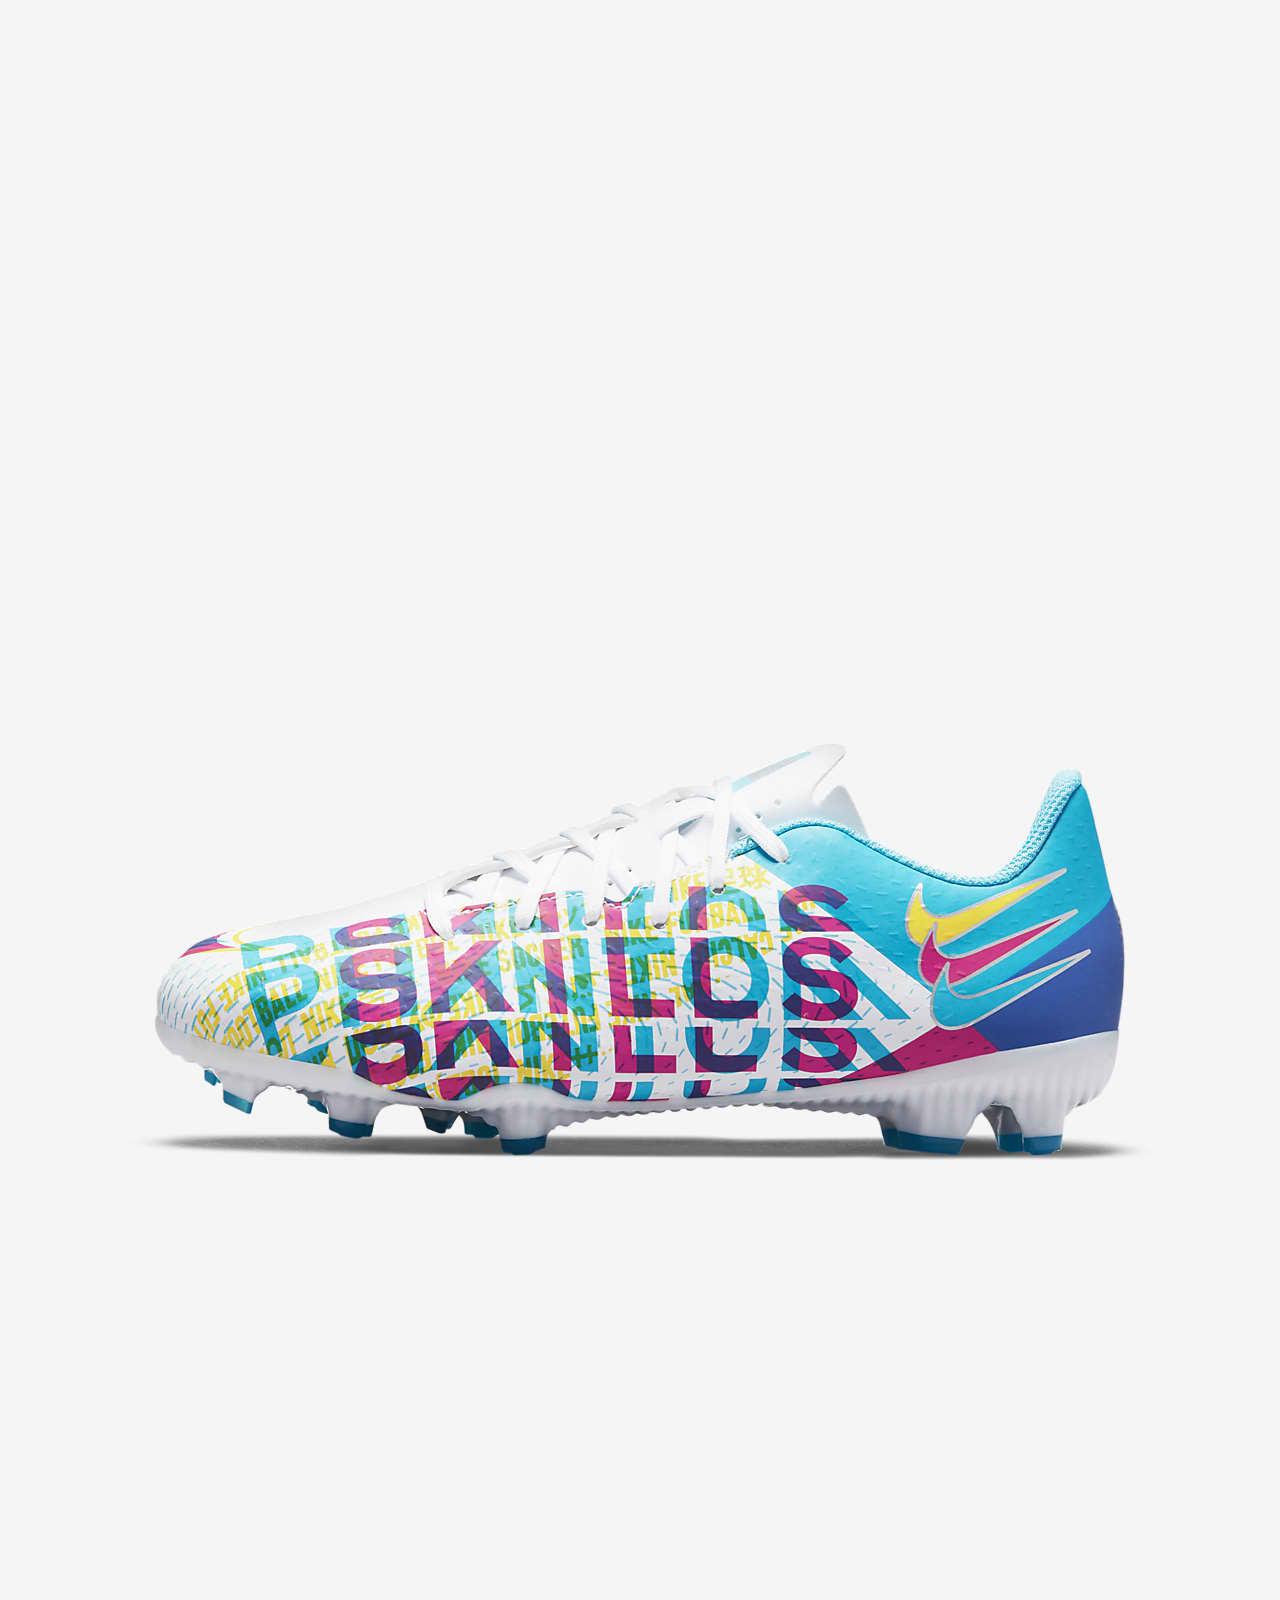 Nike Jr. Phantom GT Academy 3D MG Younger/Older Kids' Multi-Ground Football Boot